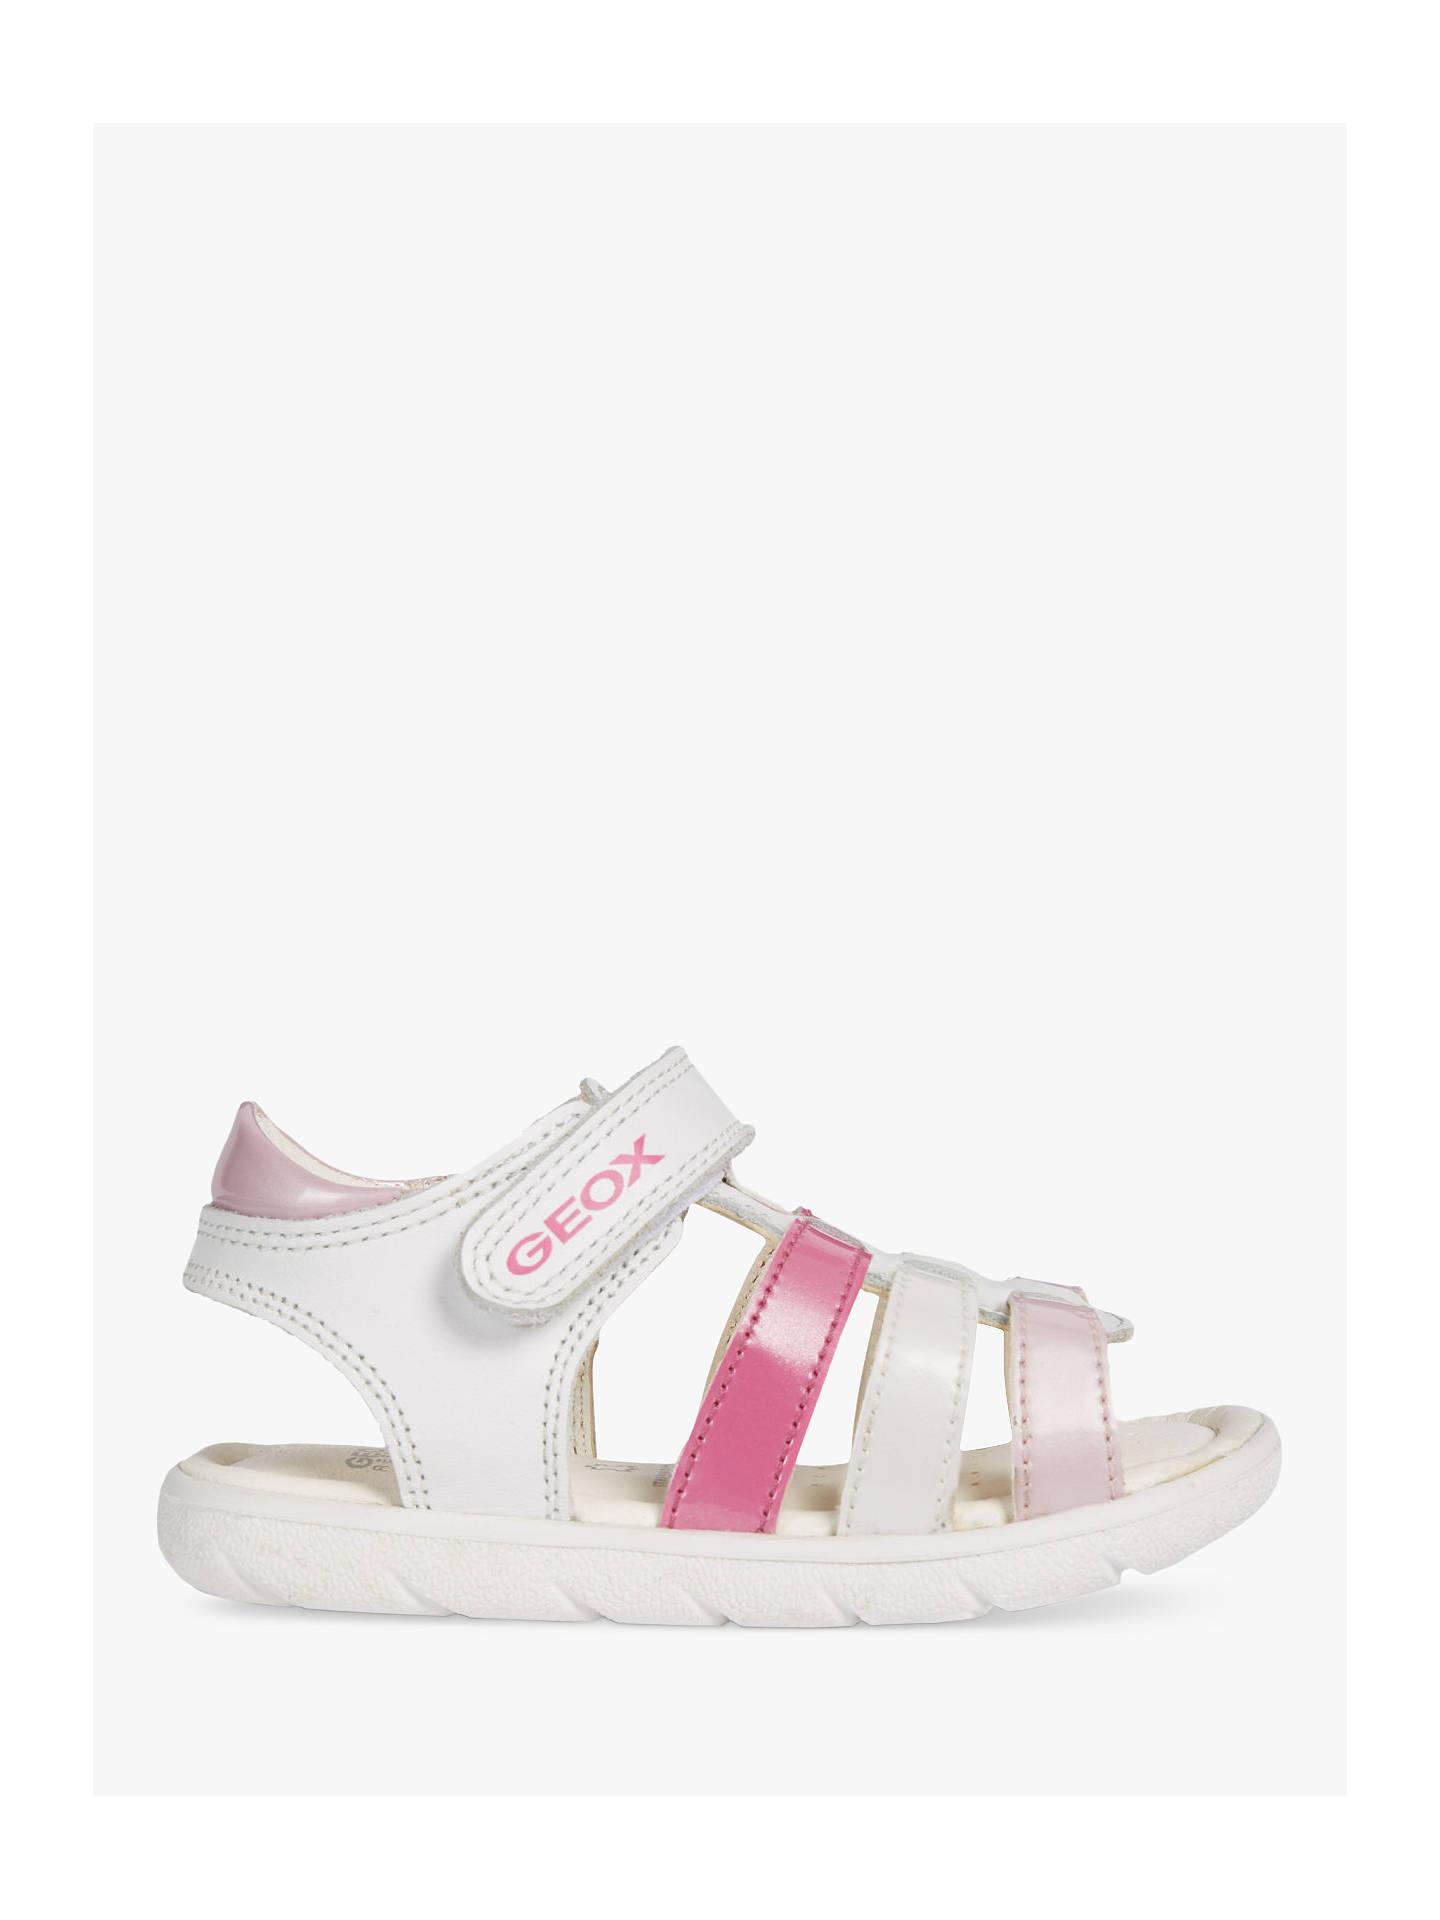 8be3efbc865b Geox Children's S Alul Riptape Sandals, White/Pink at John Lewis ...